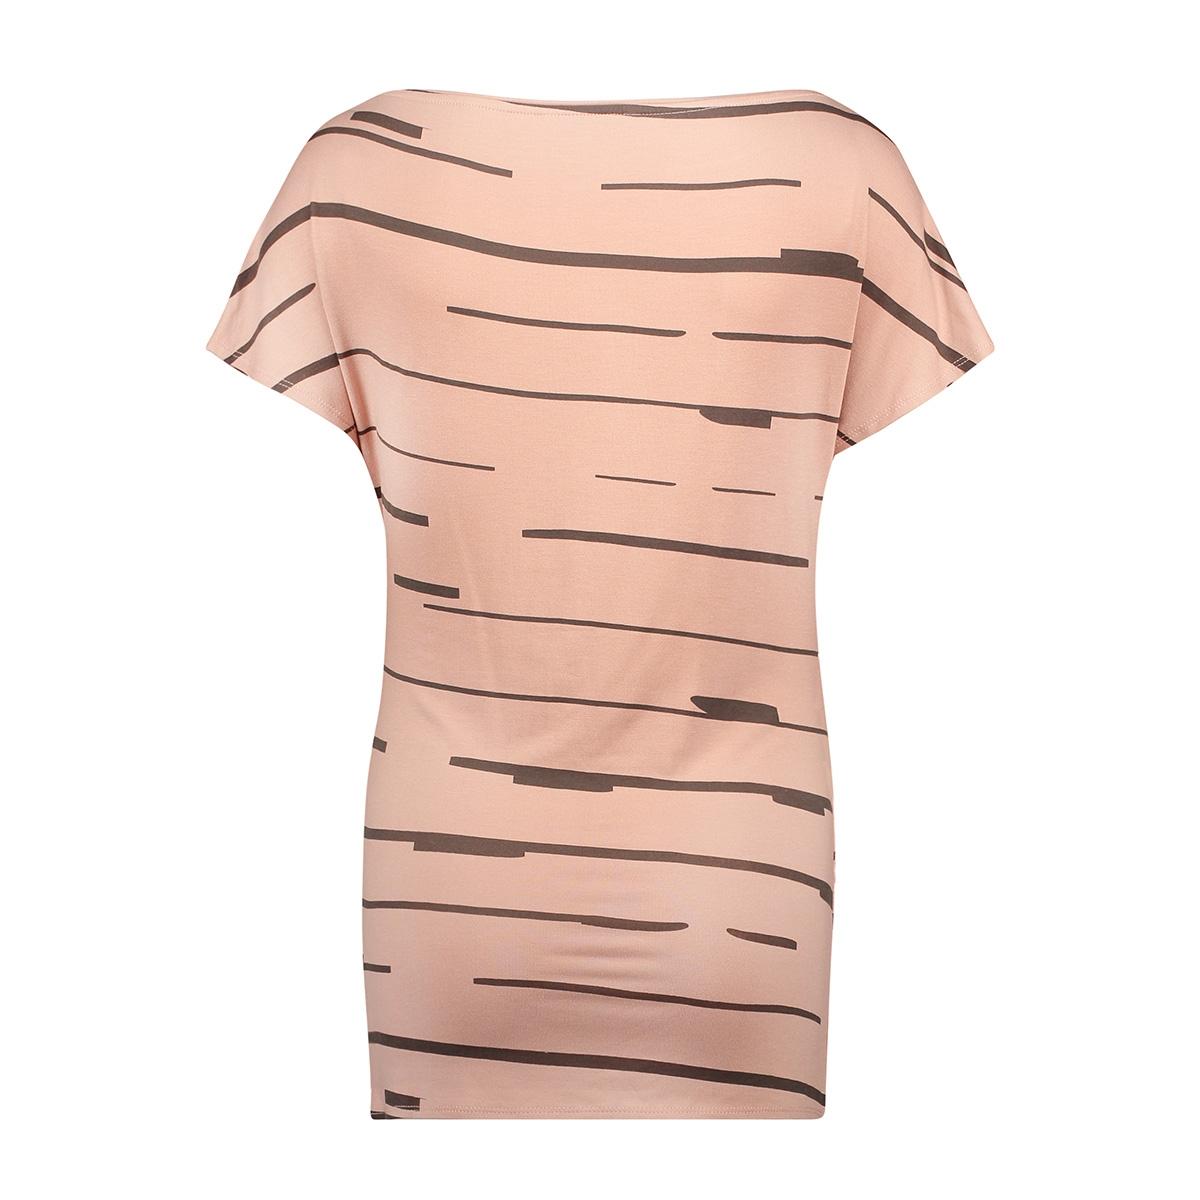 80128 tee arielle noppies positie shirt blush